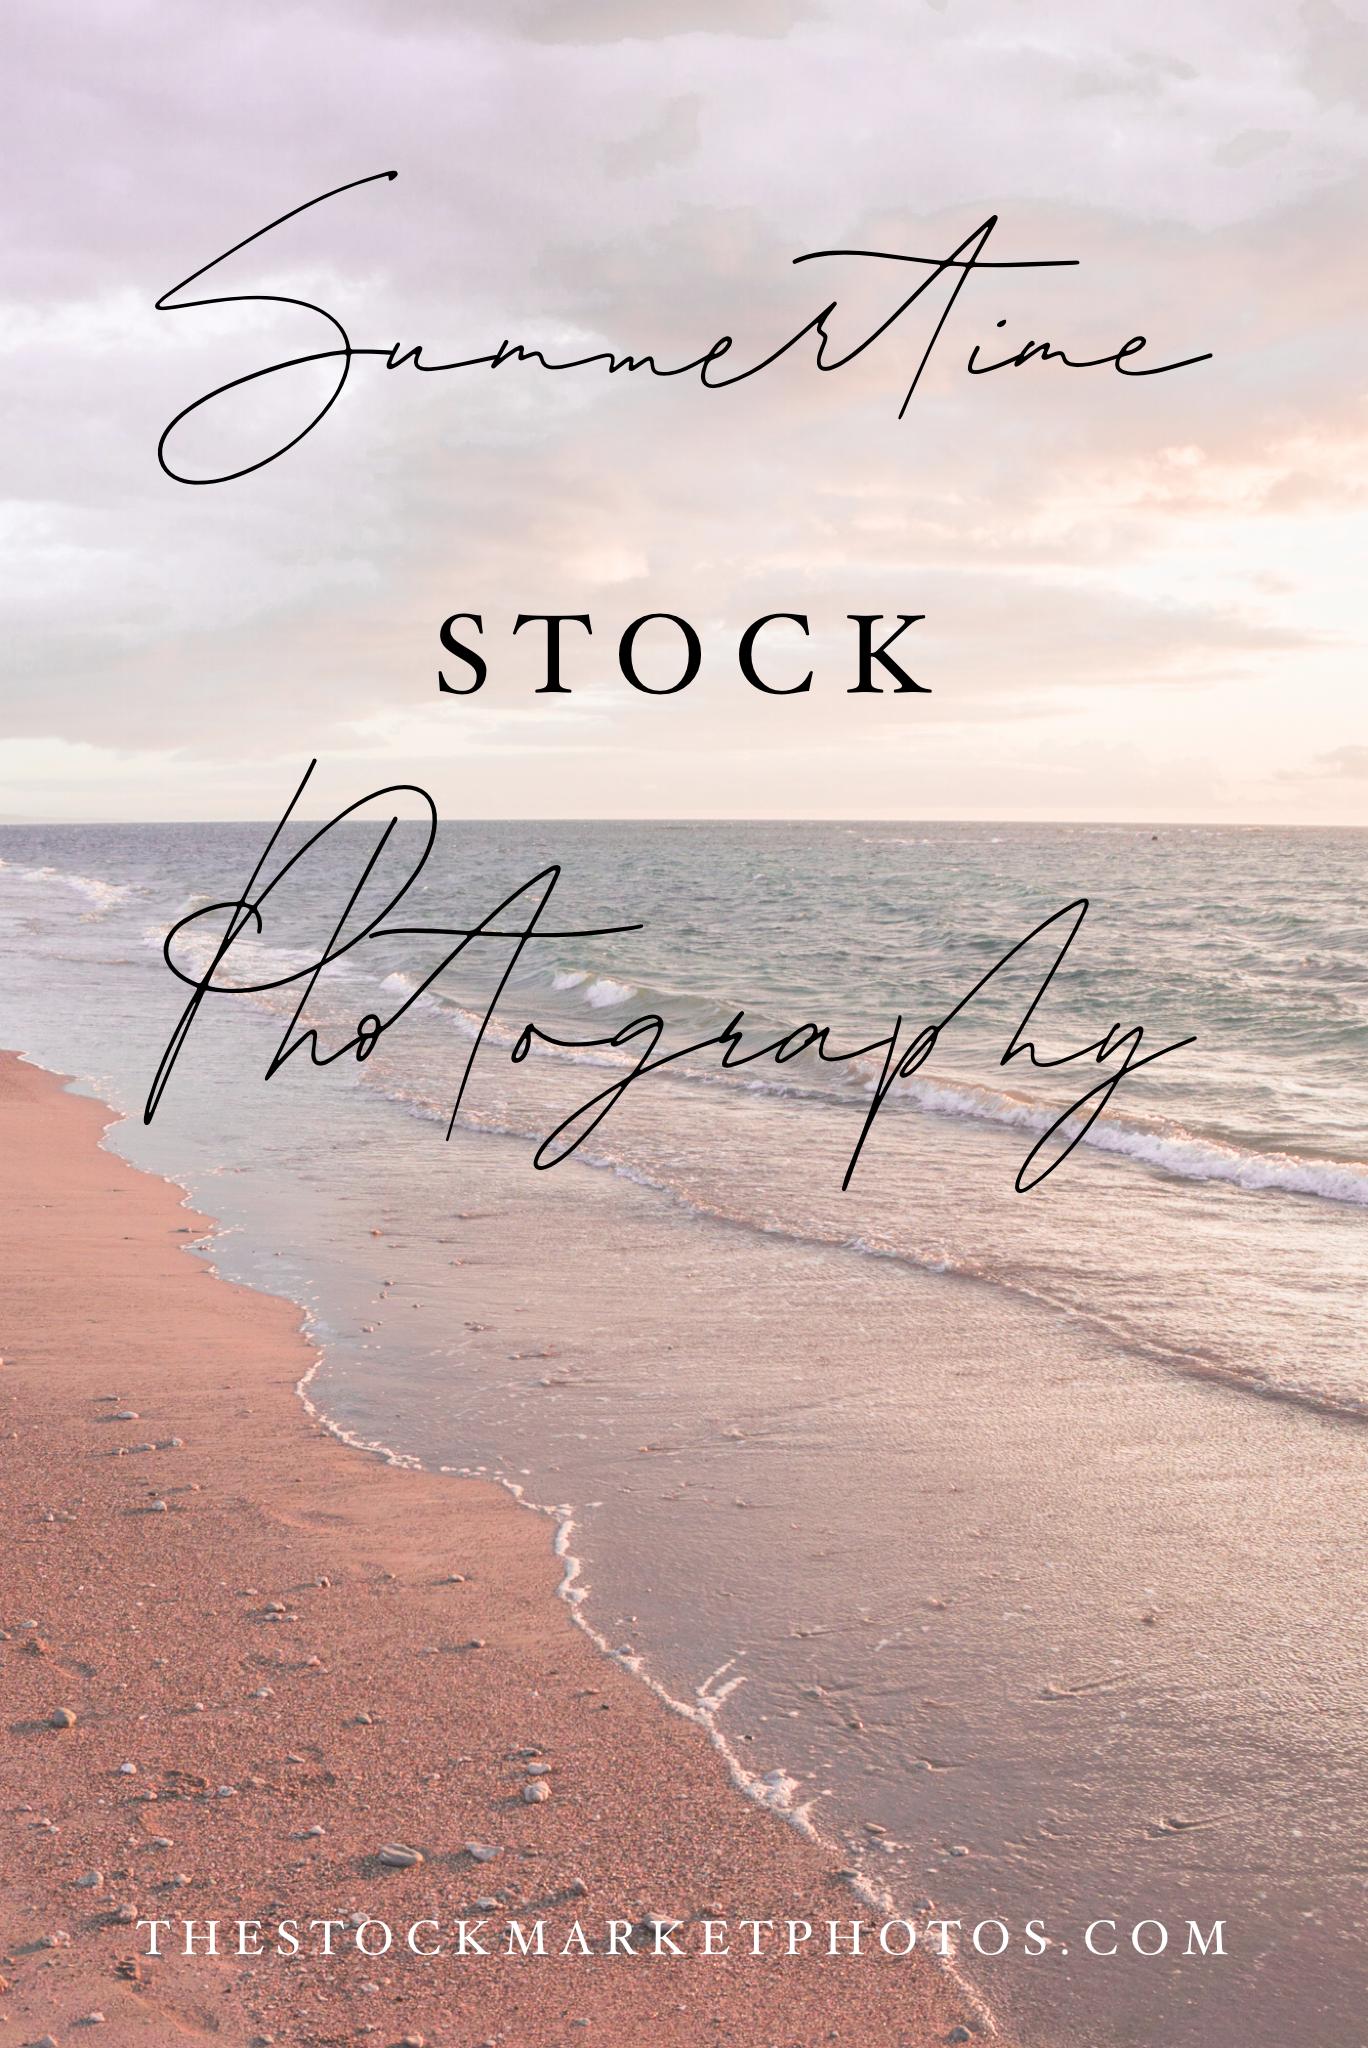 Summertime stock Photos.PNG